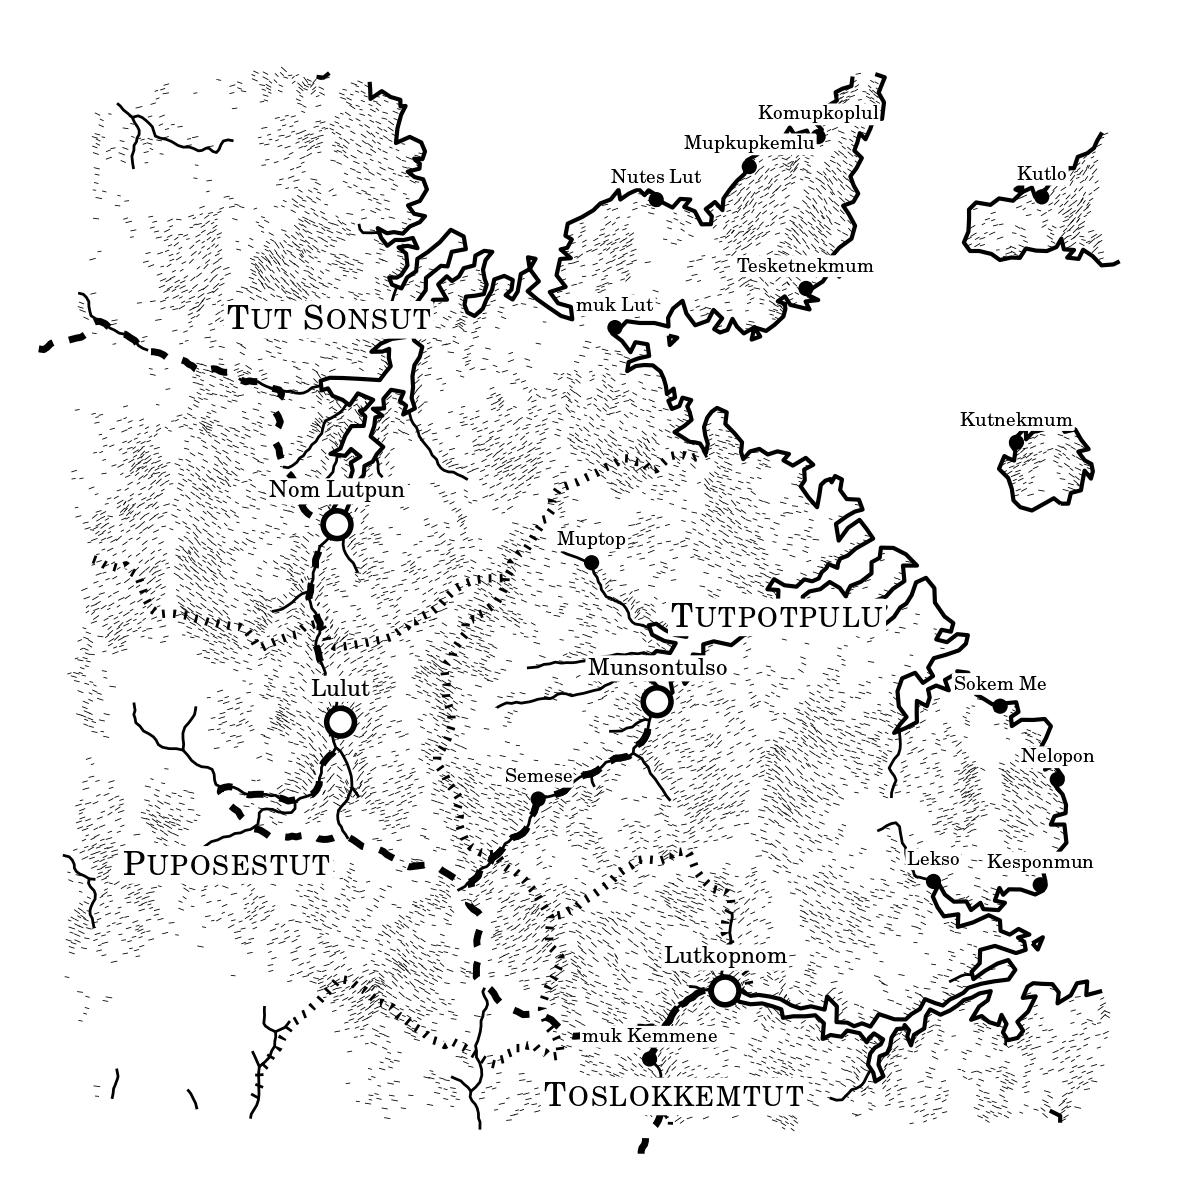 Generating Fantasy Maps